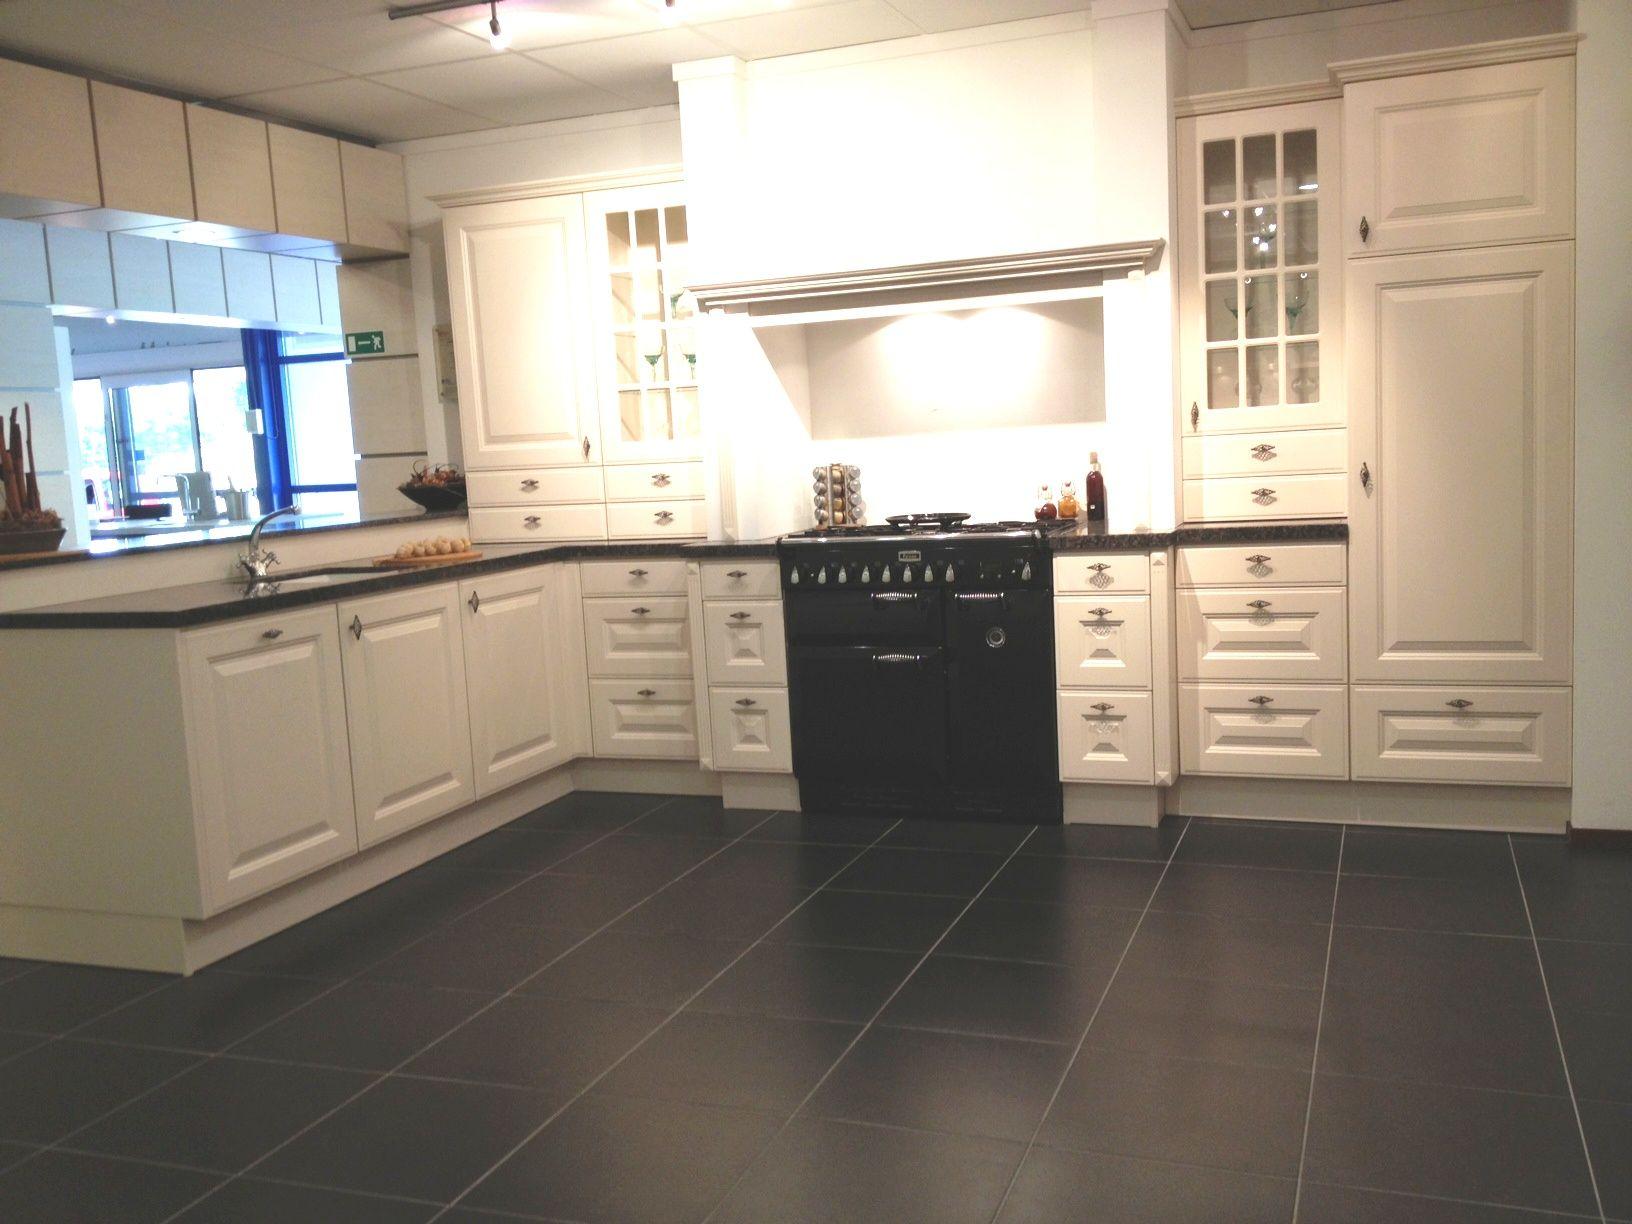 Keller keukens is puur dutch design product in beeld